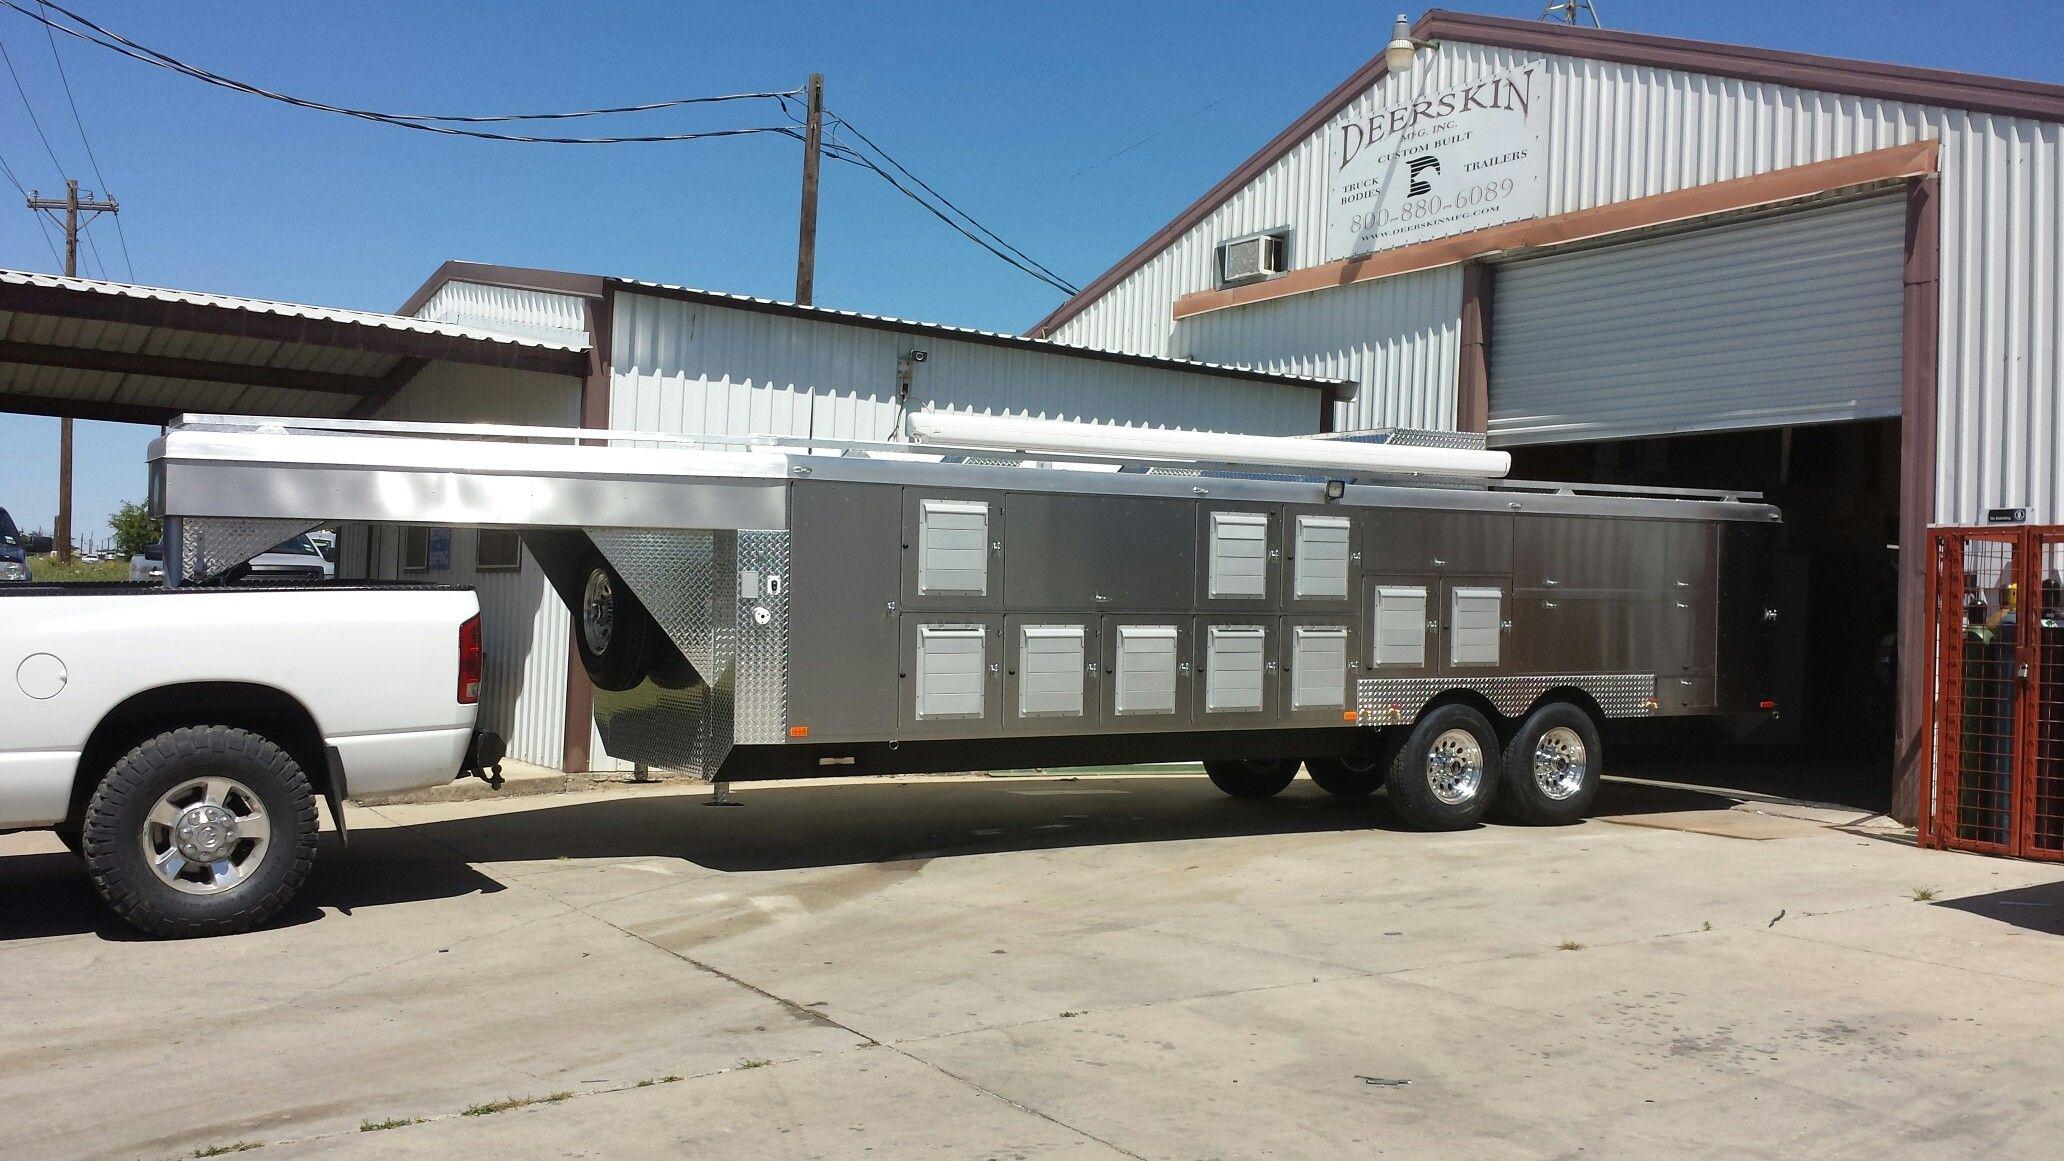 20 hole atv dog trailer